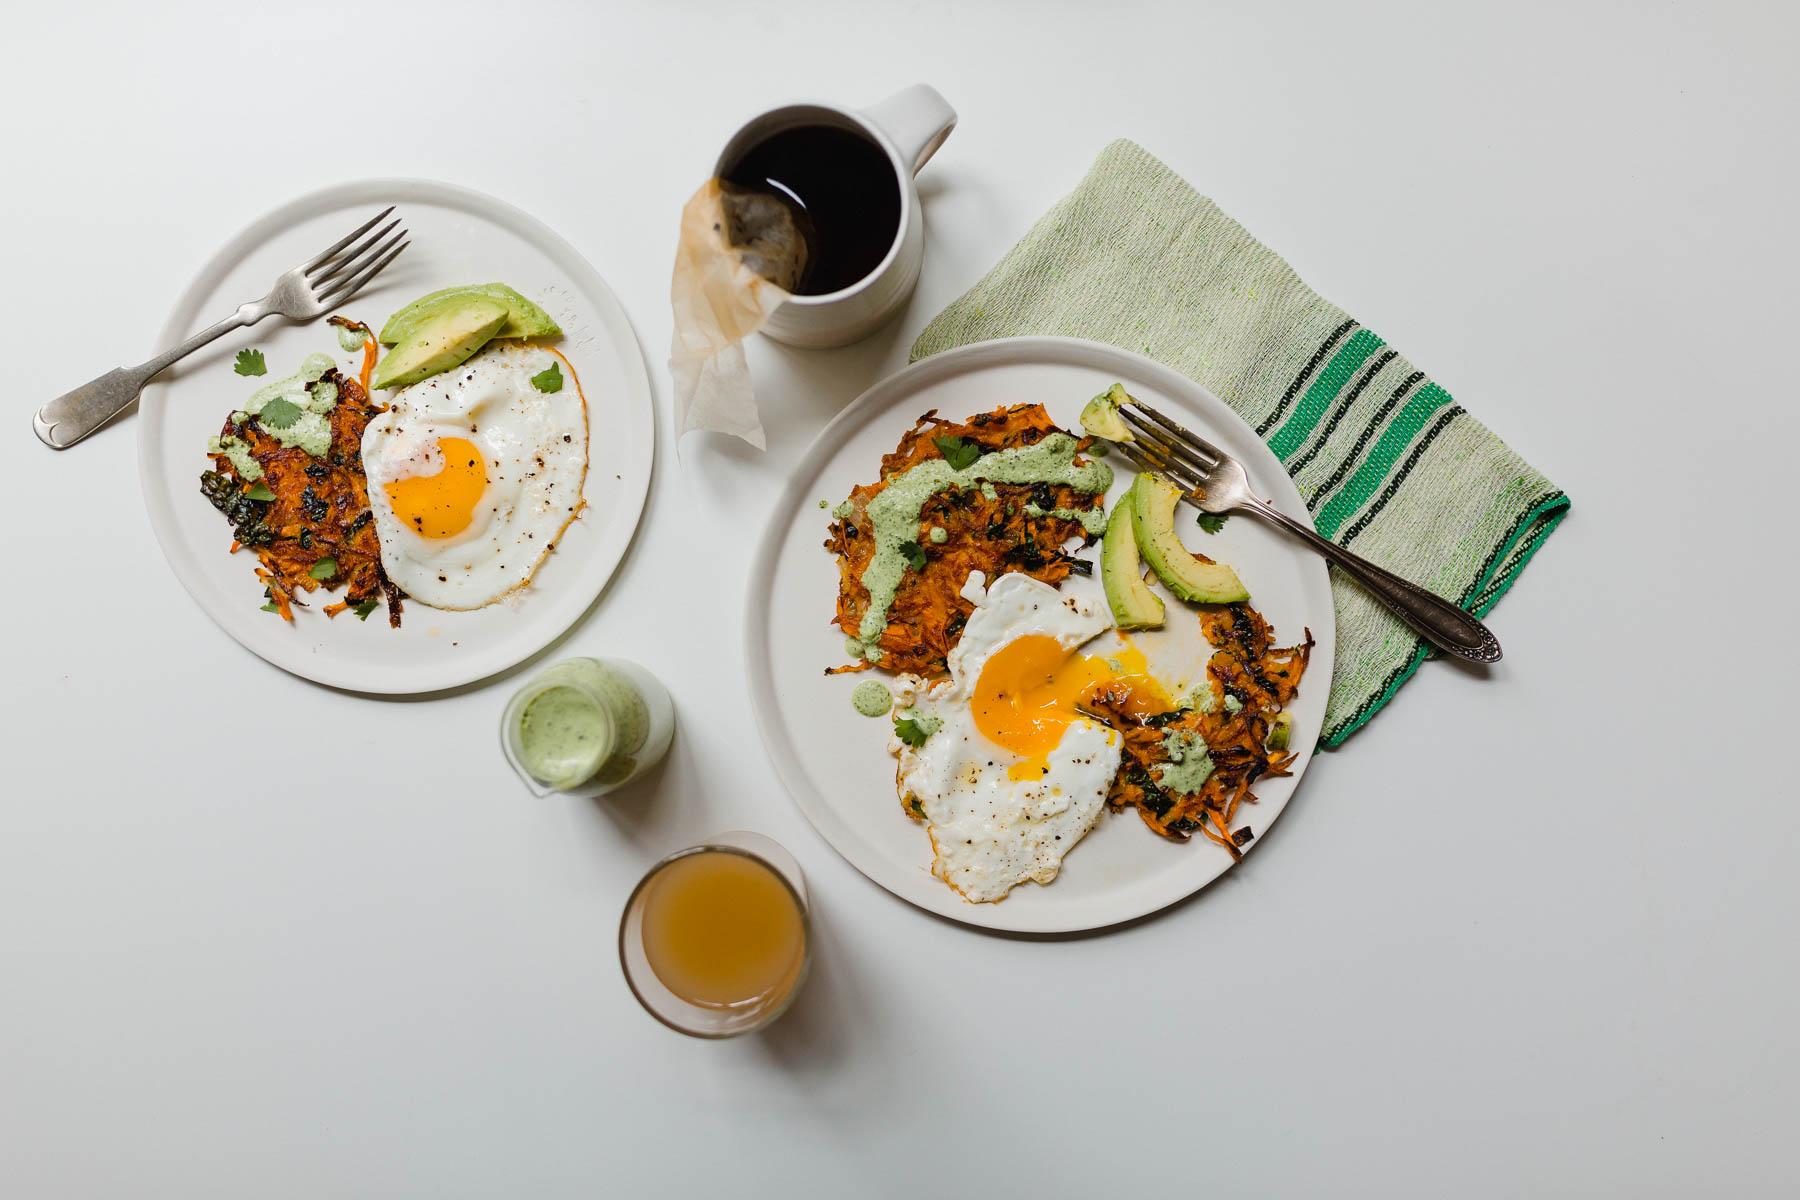 chicago-nyc-food-lifestyle-photographer-18.jpg